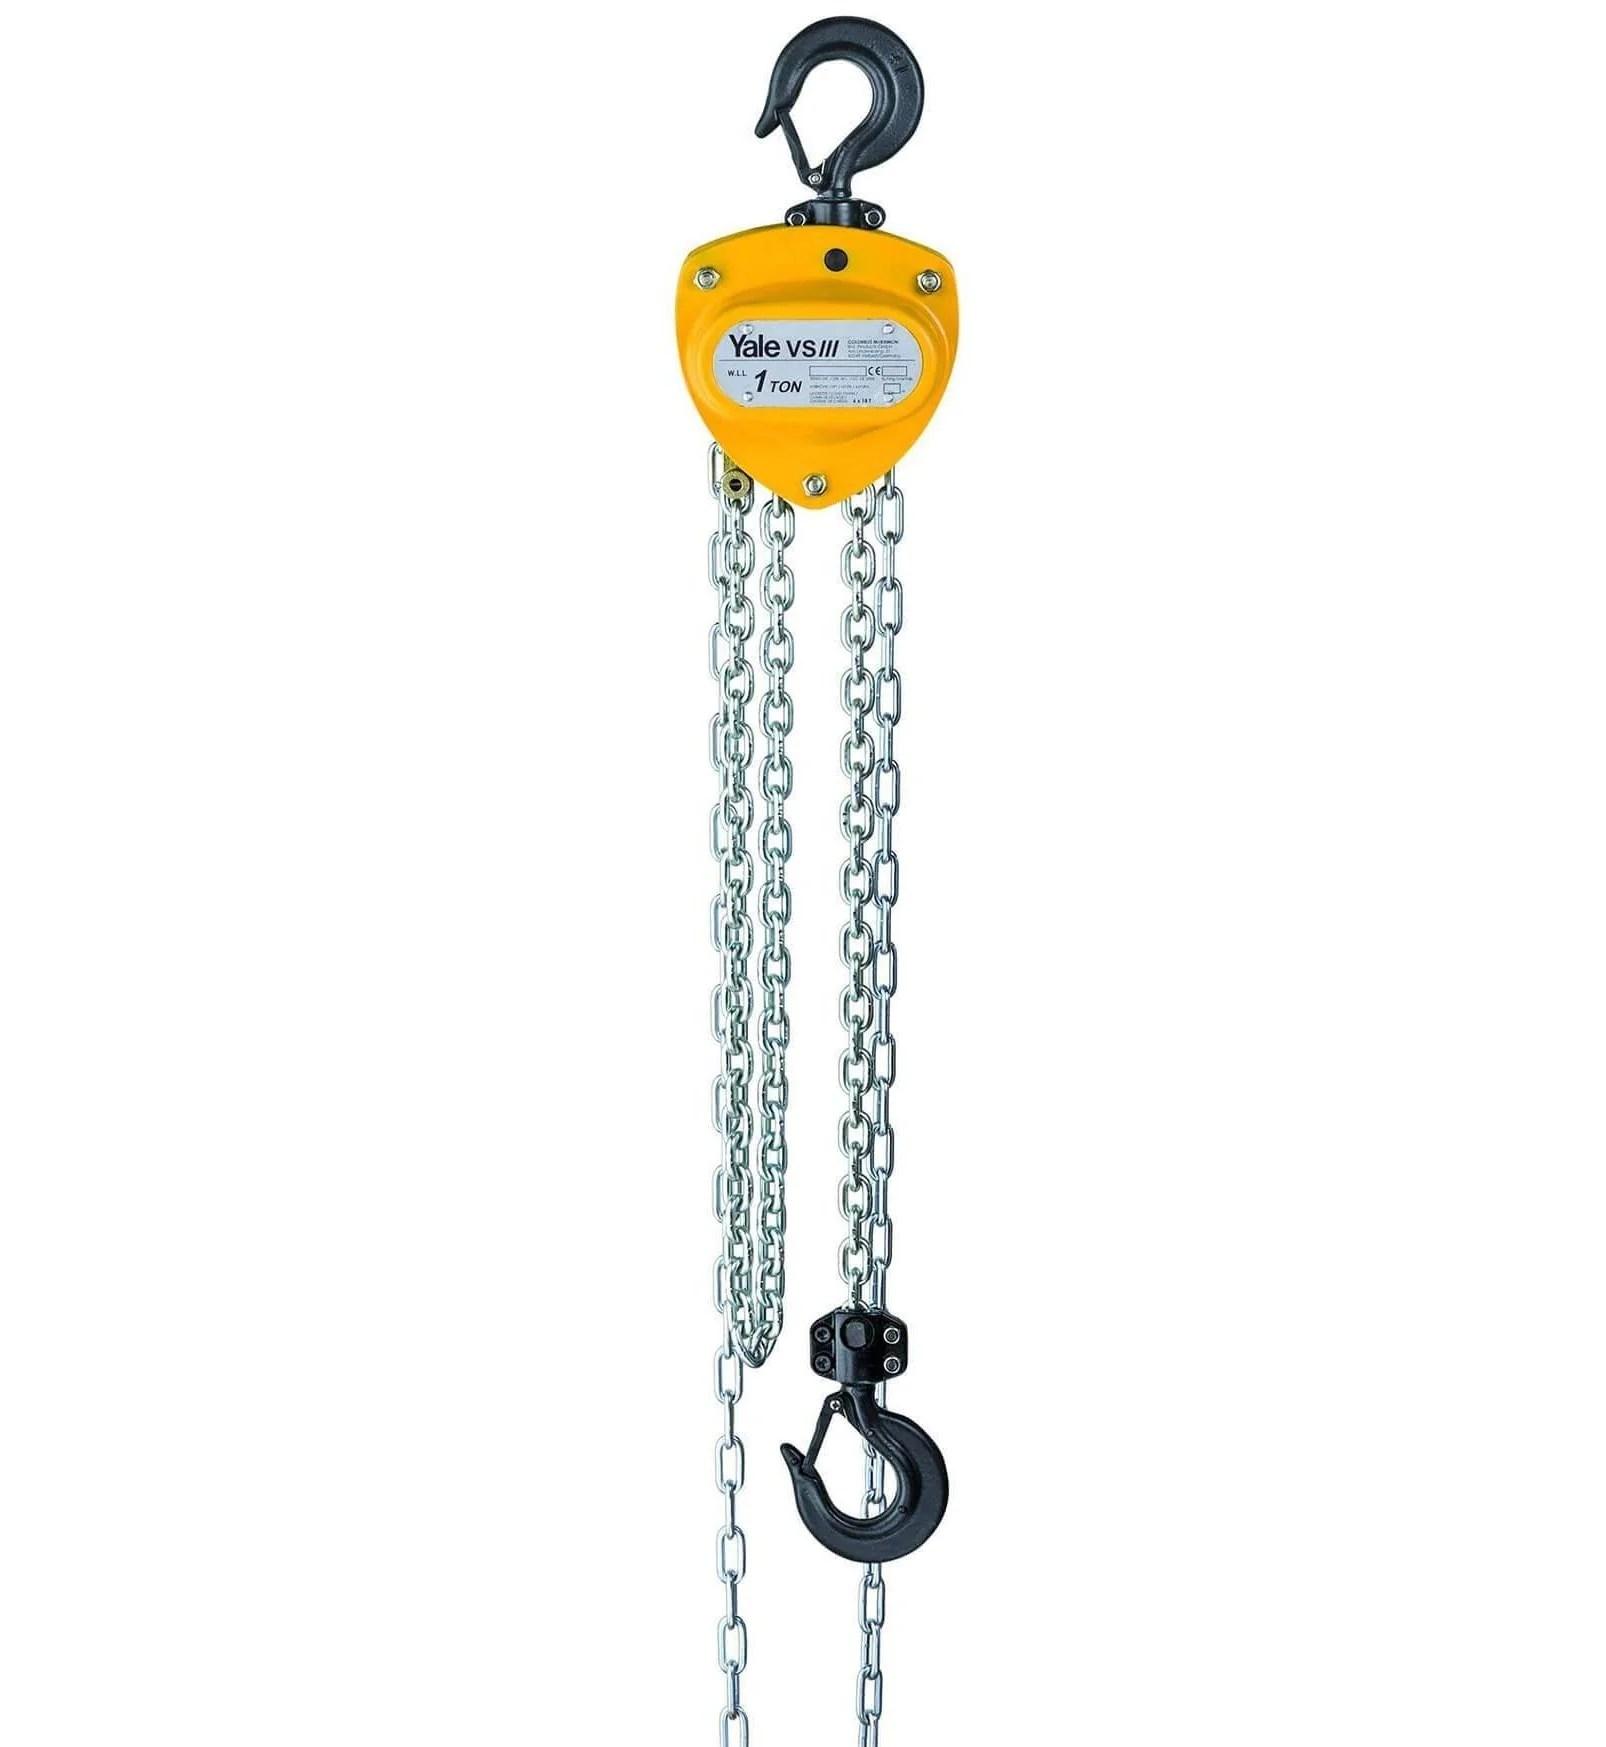 medium resolution of yale chain hoist wiring diagram wiring diagram datasource yale chain hoist wiring diagram